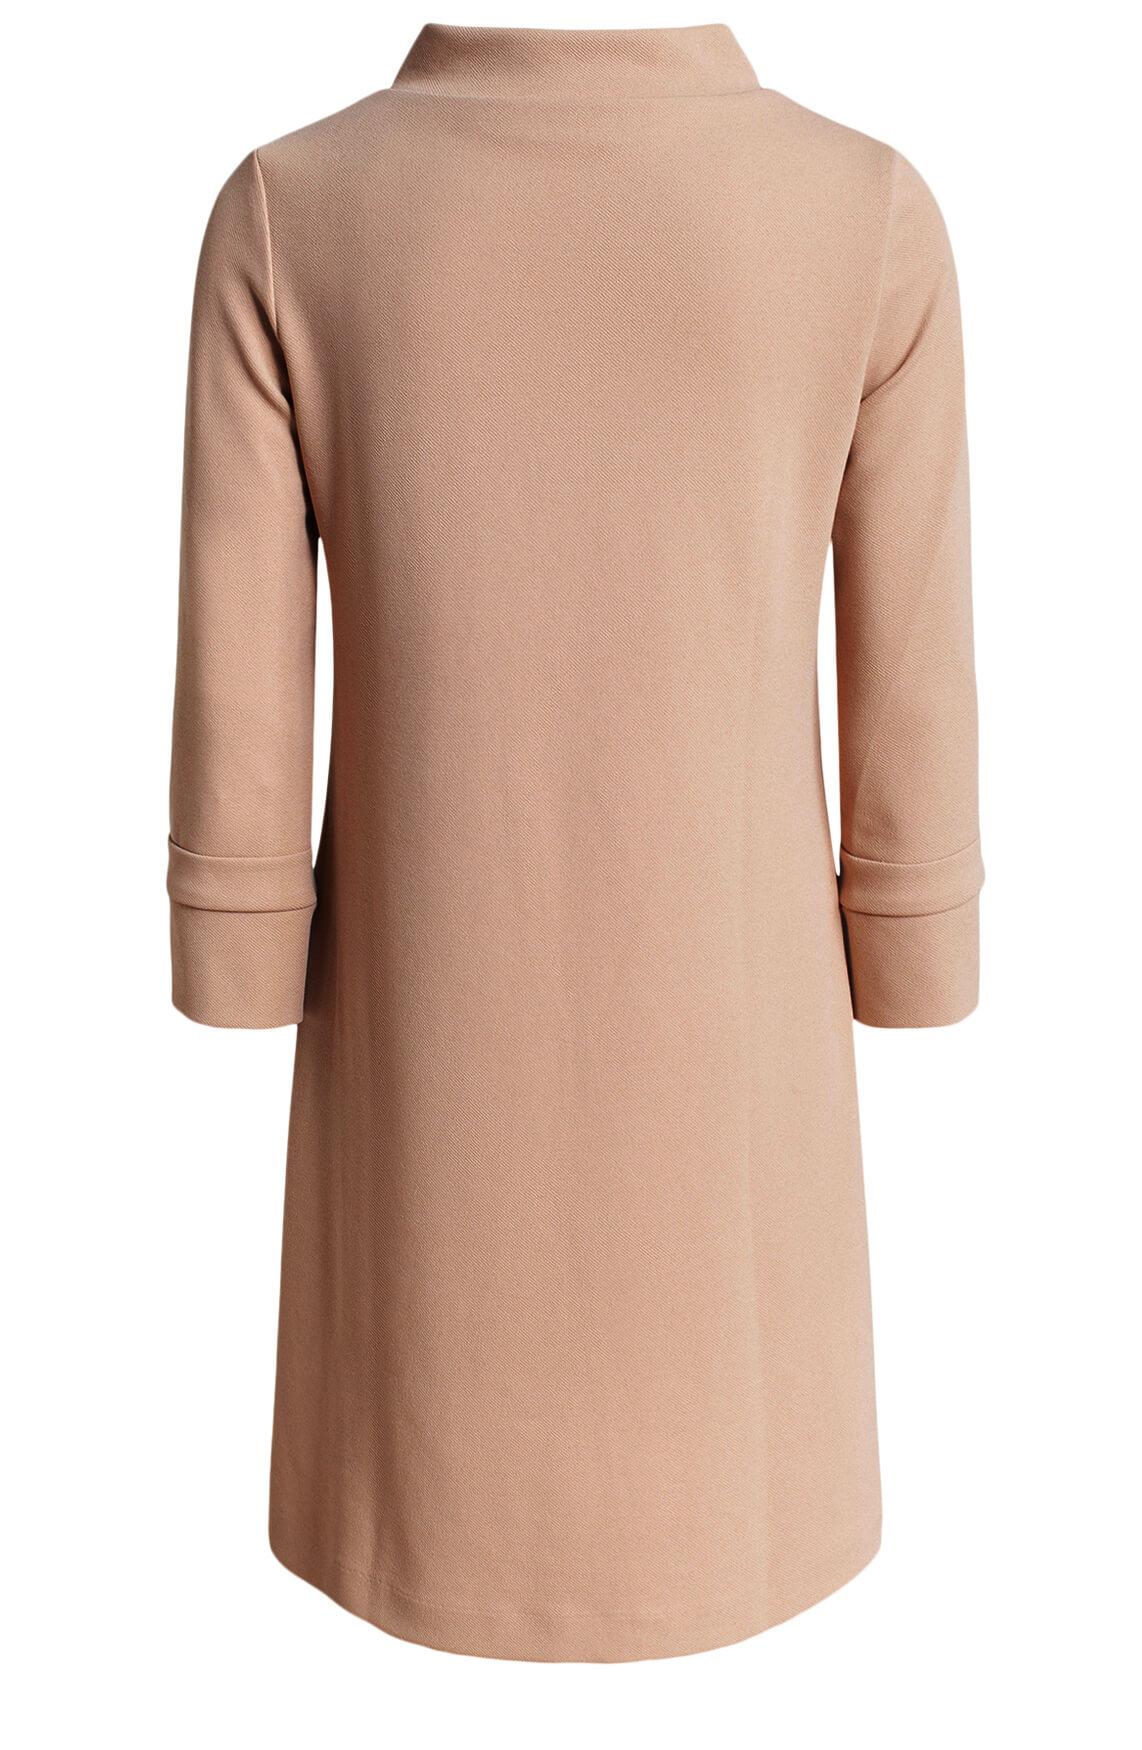 Ana Alcazar Dames Sixties jurk Bruin